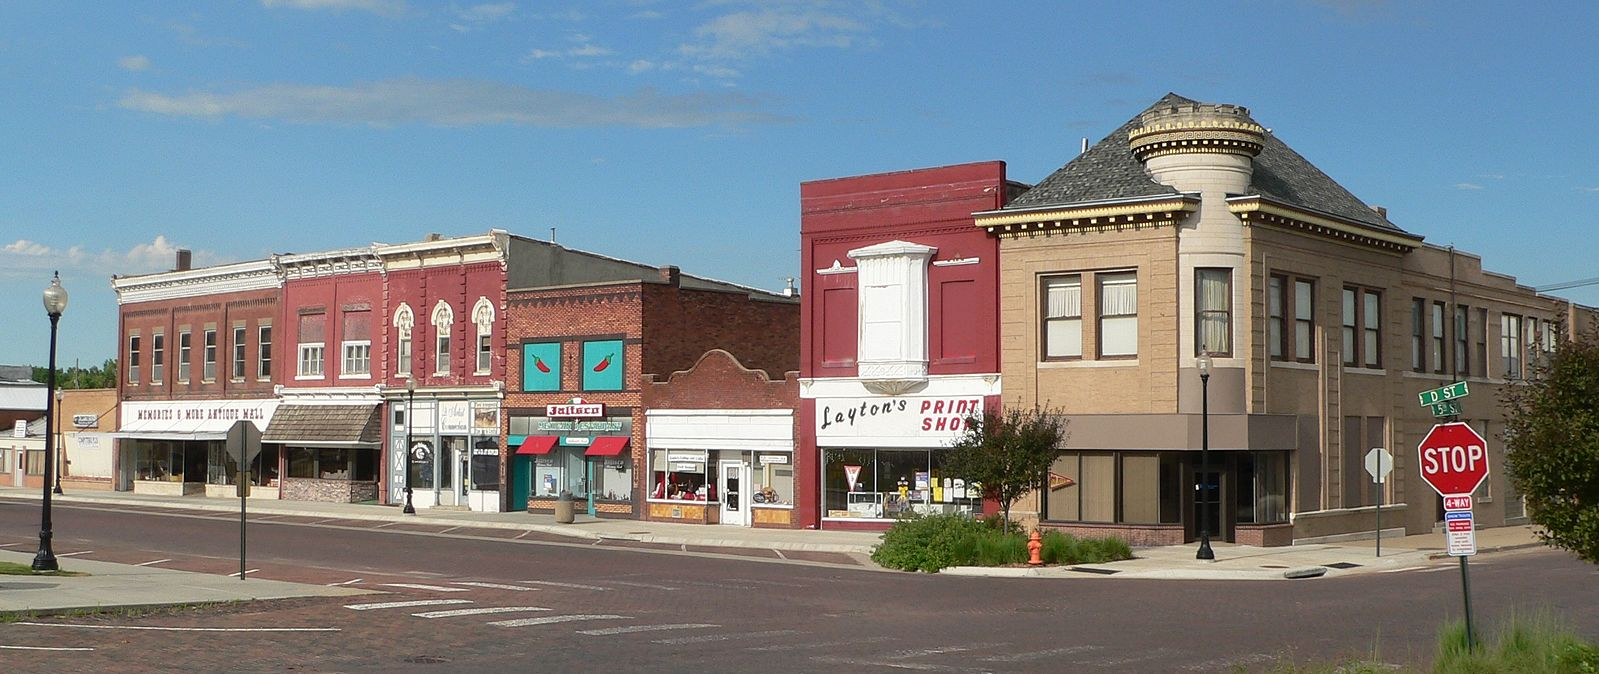 Plan A Day Trip To Charming Fairbury Nebraska